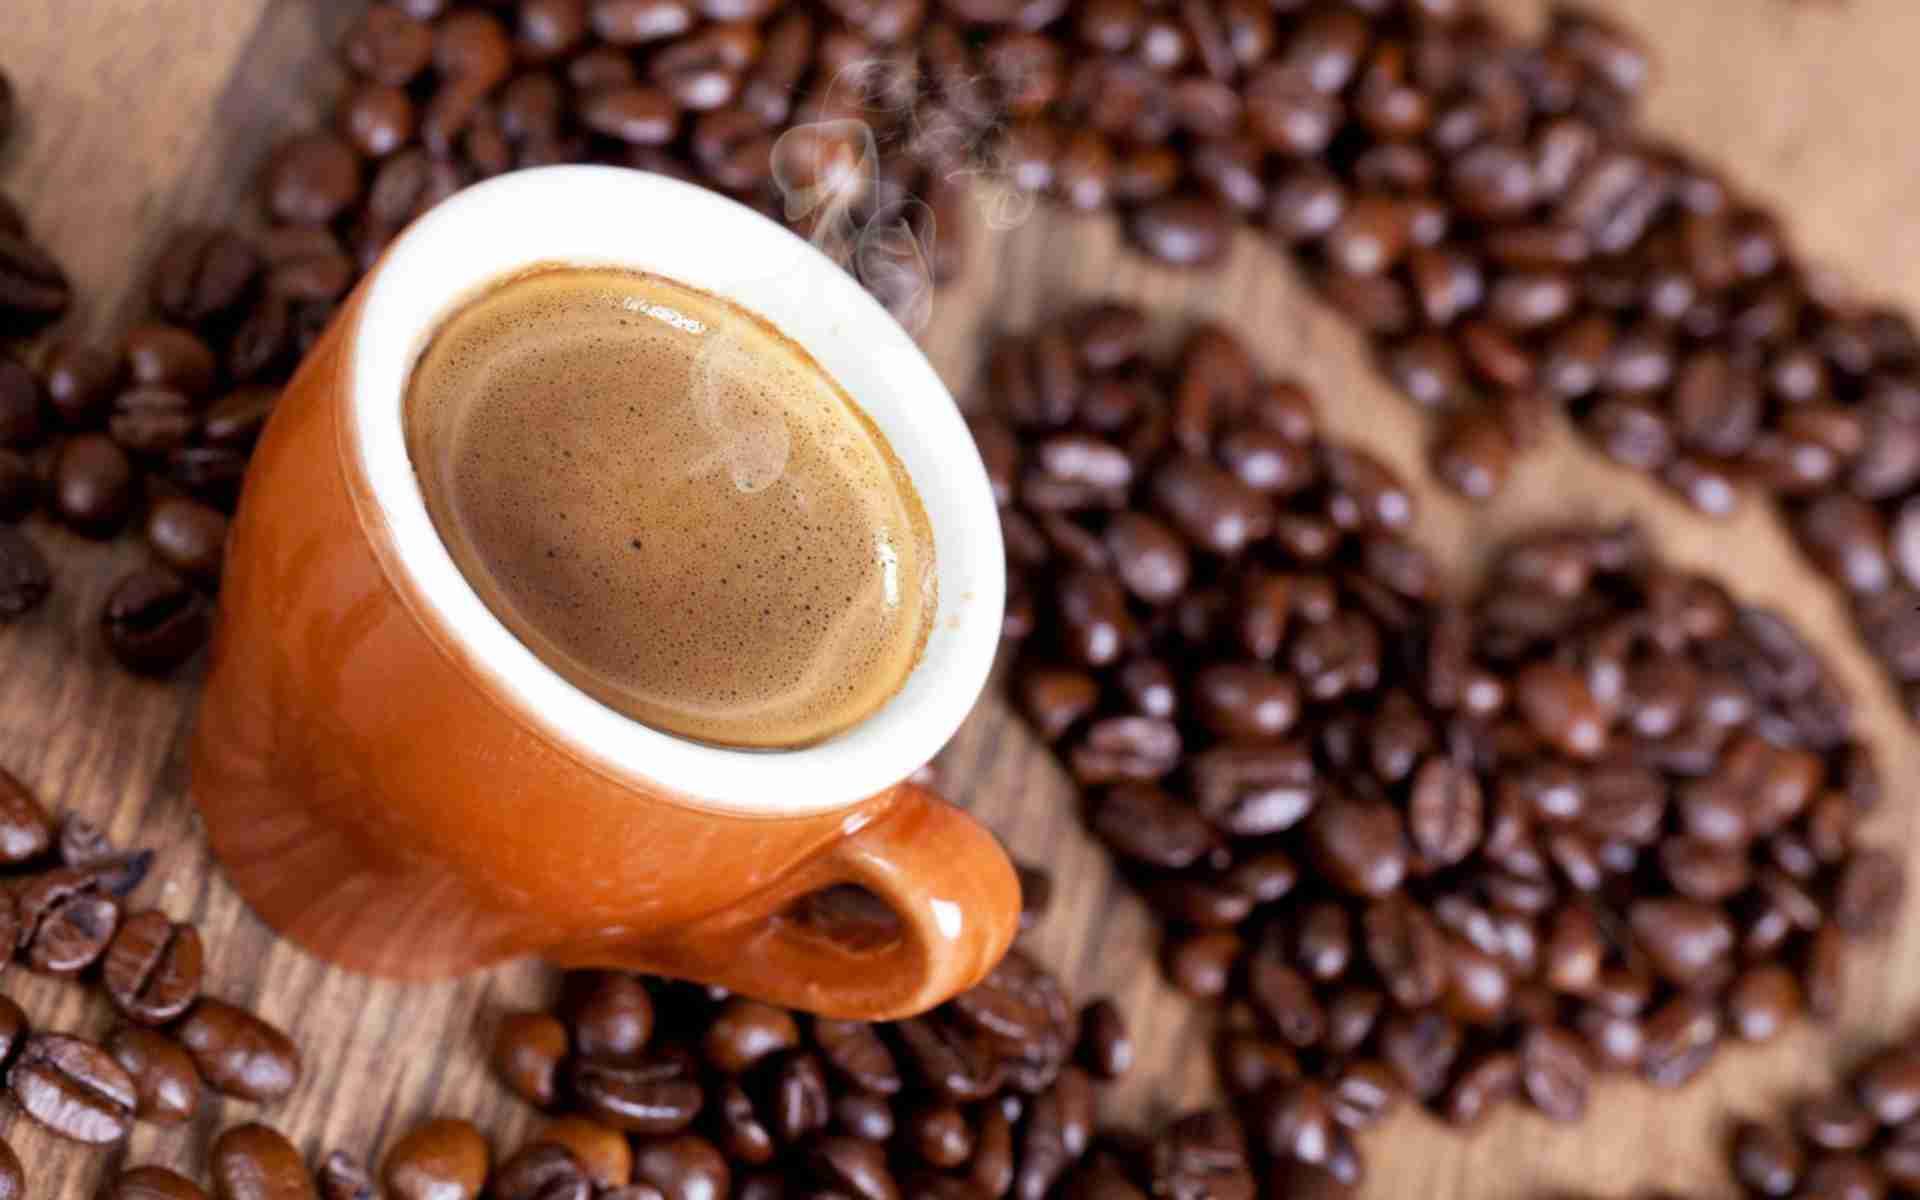 DOWNLOAD: espresso hd free background 2560 x 1600